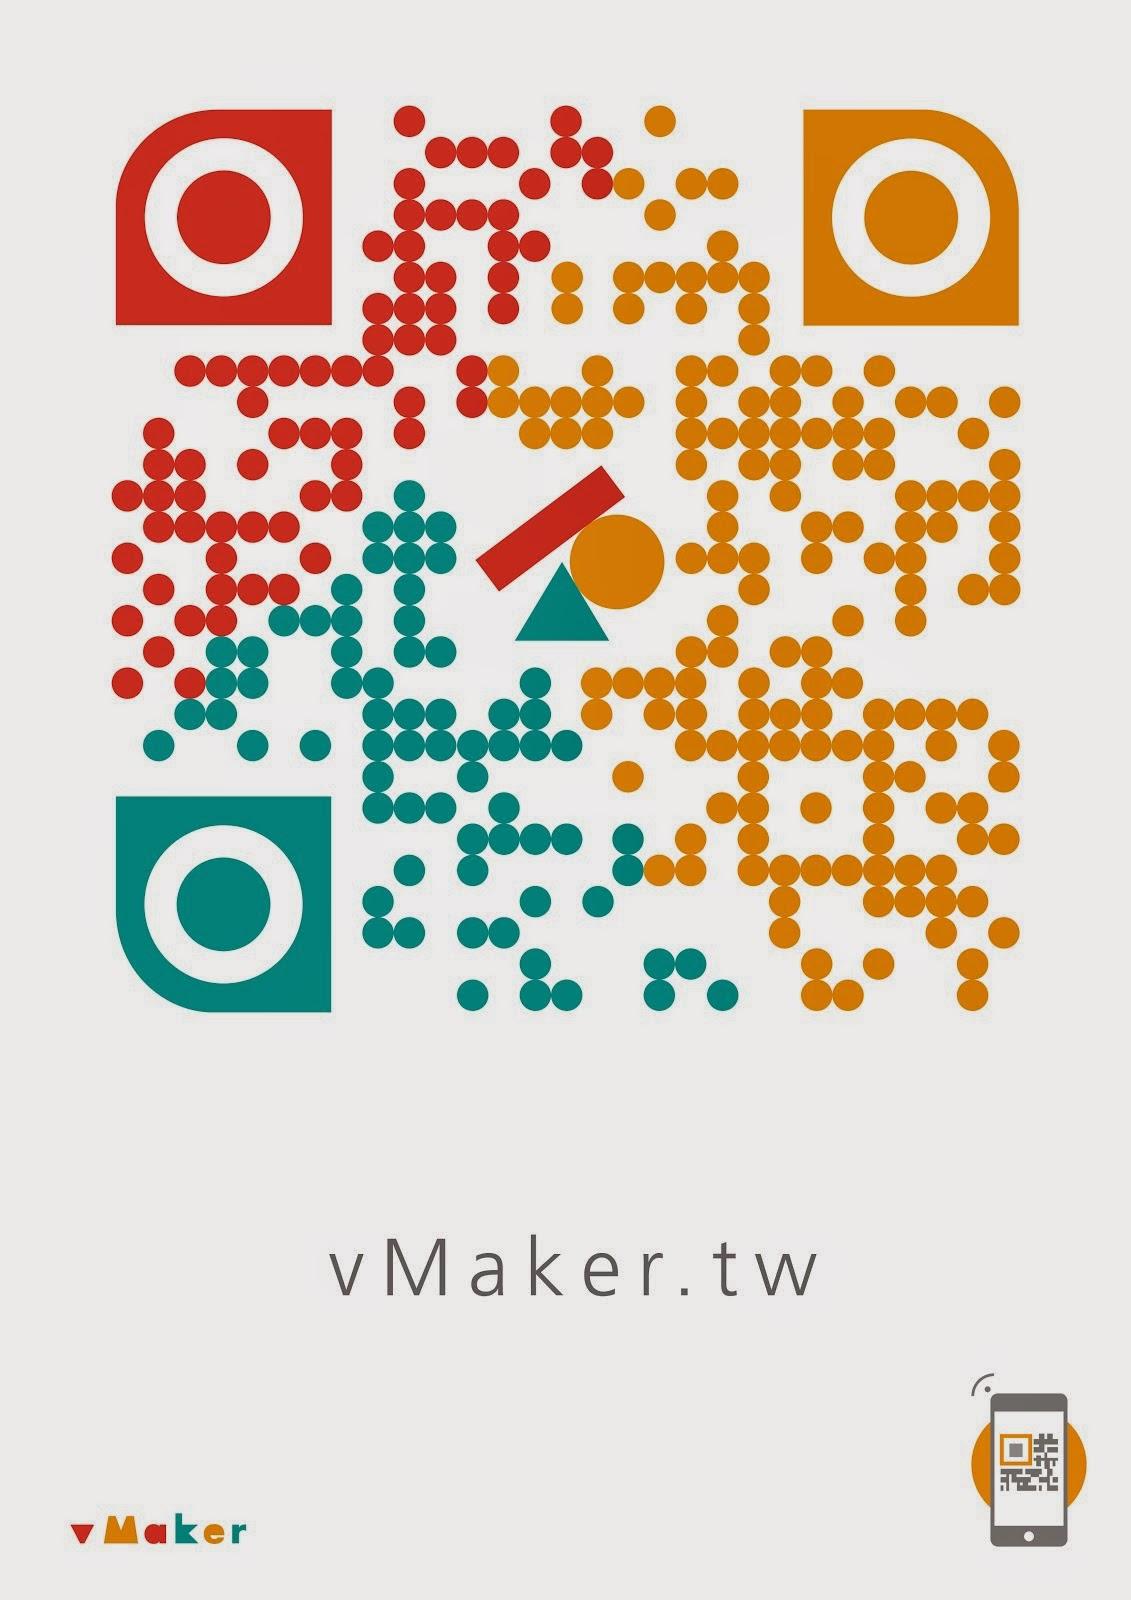 vMaker